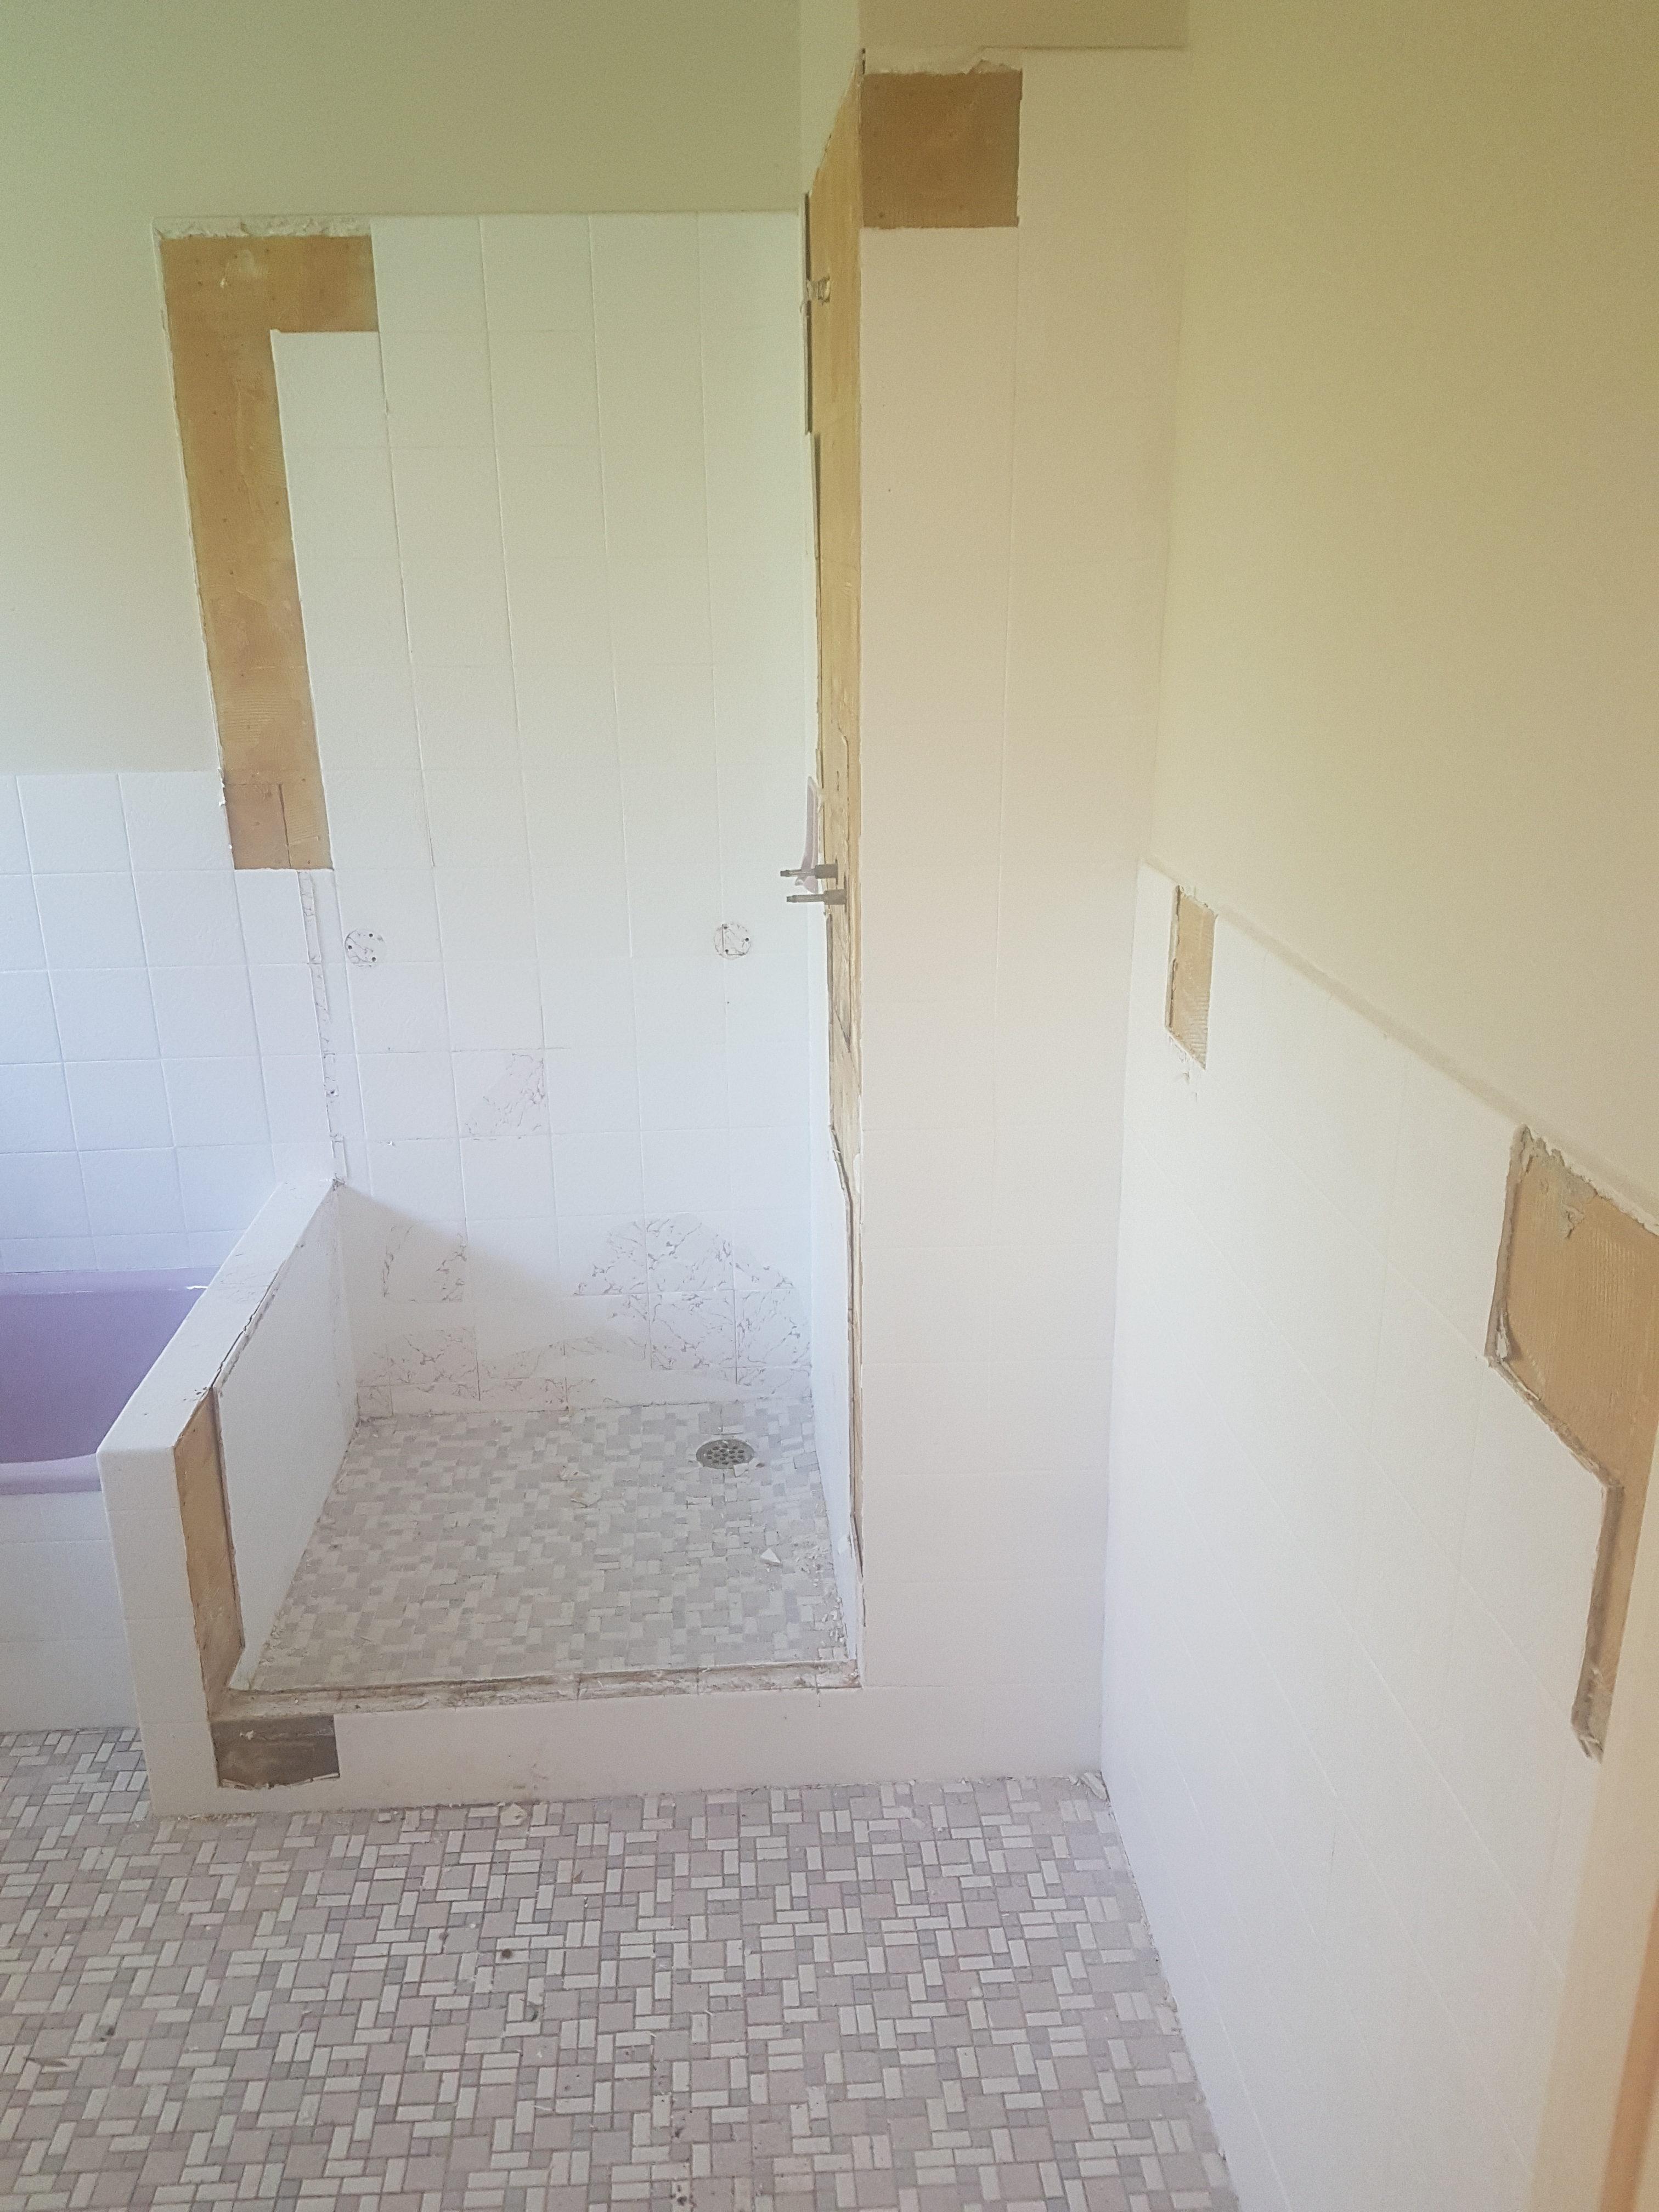 Bathroom Start to Finish